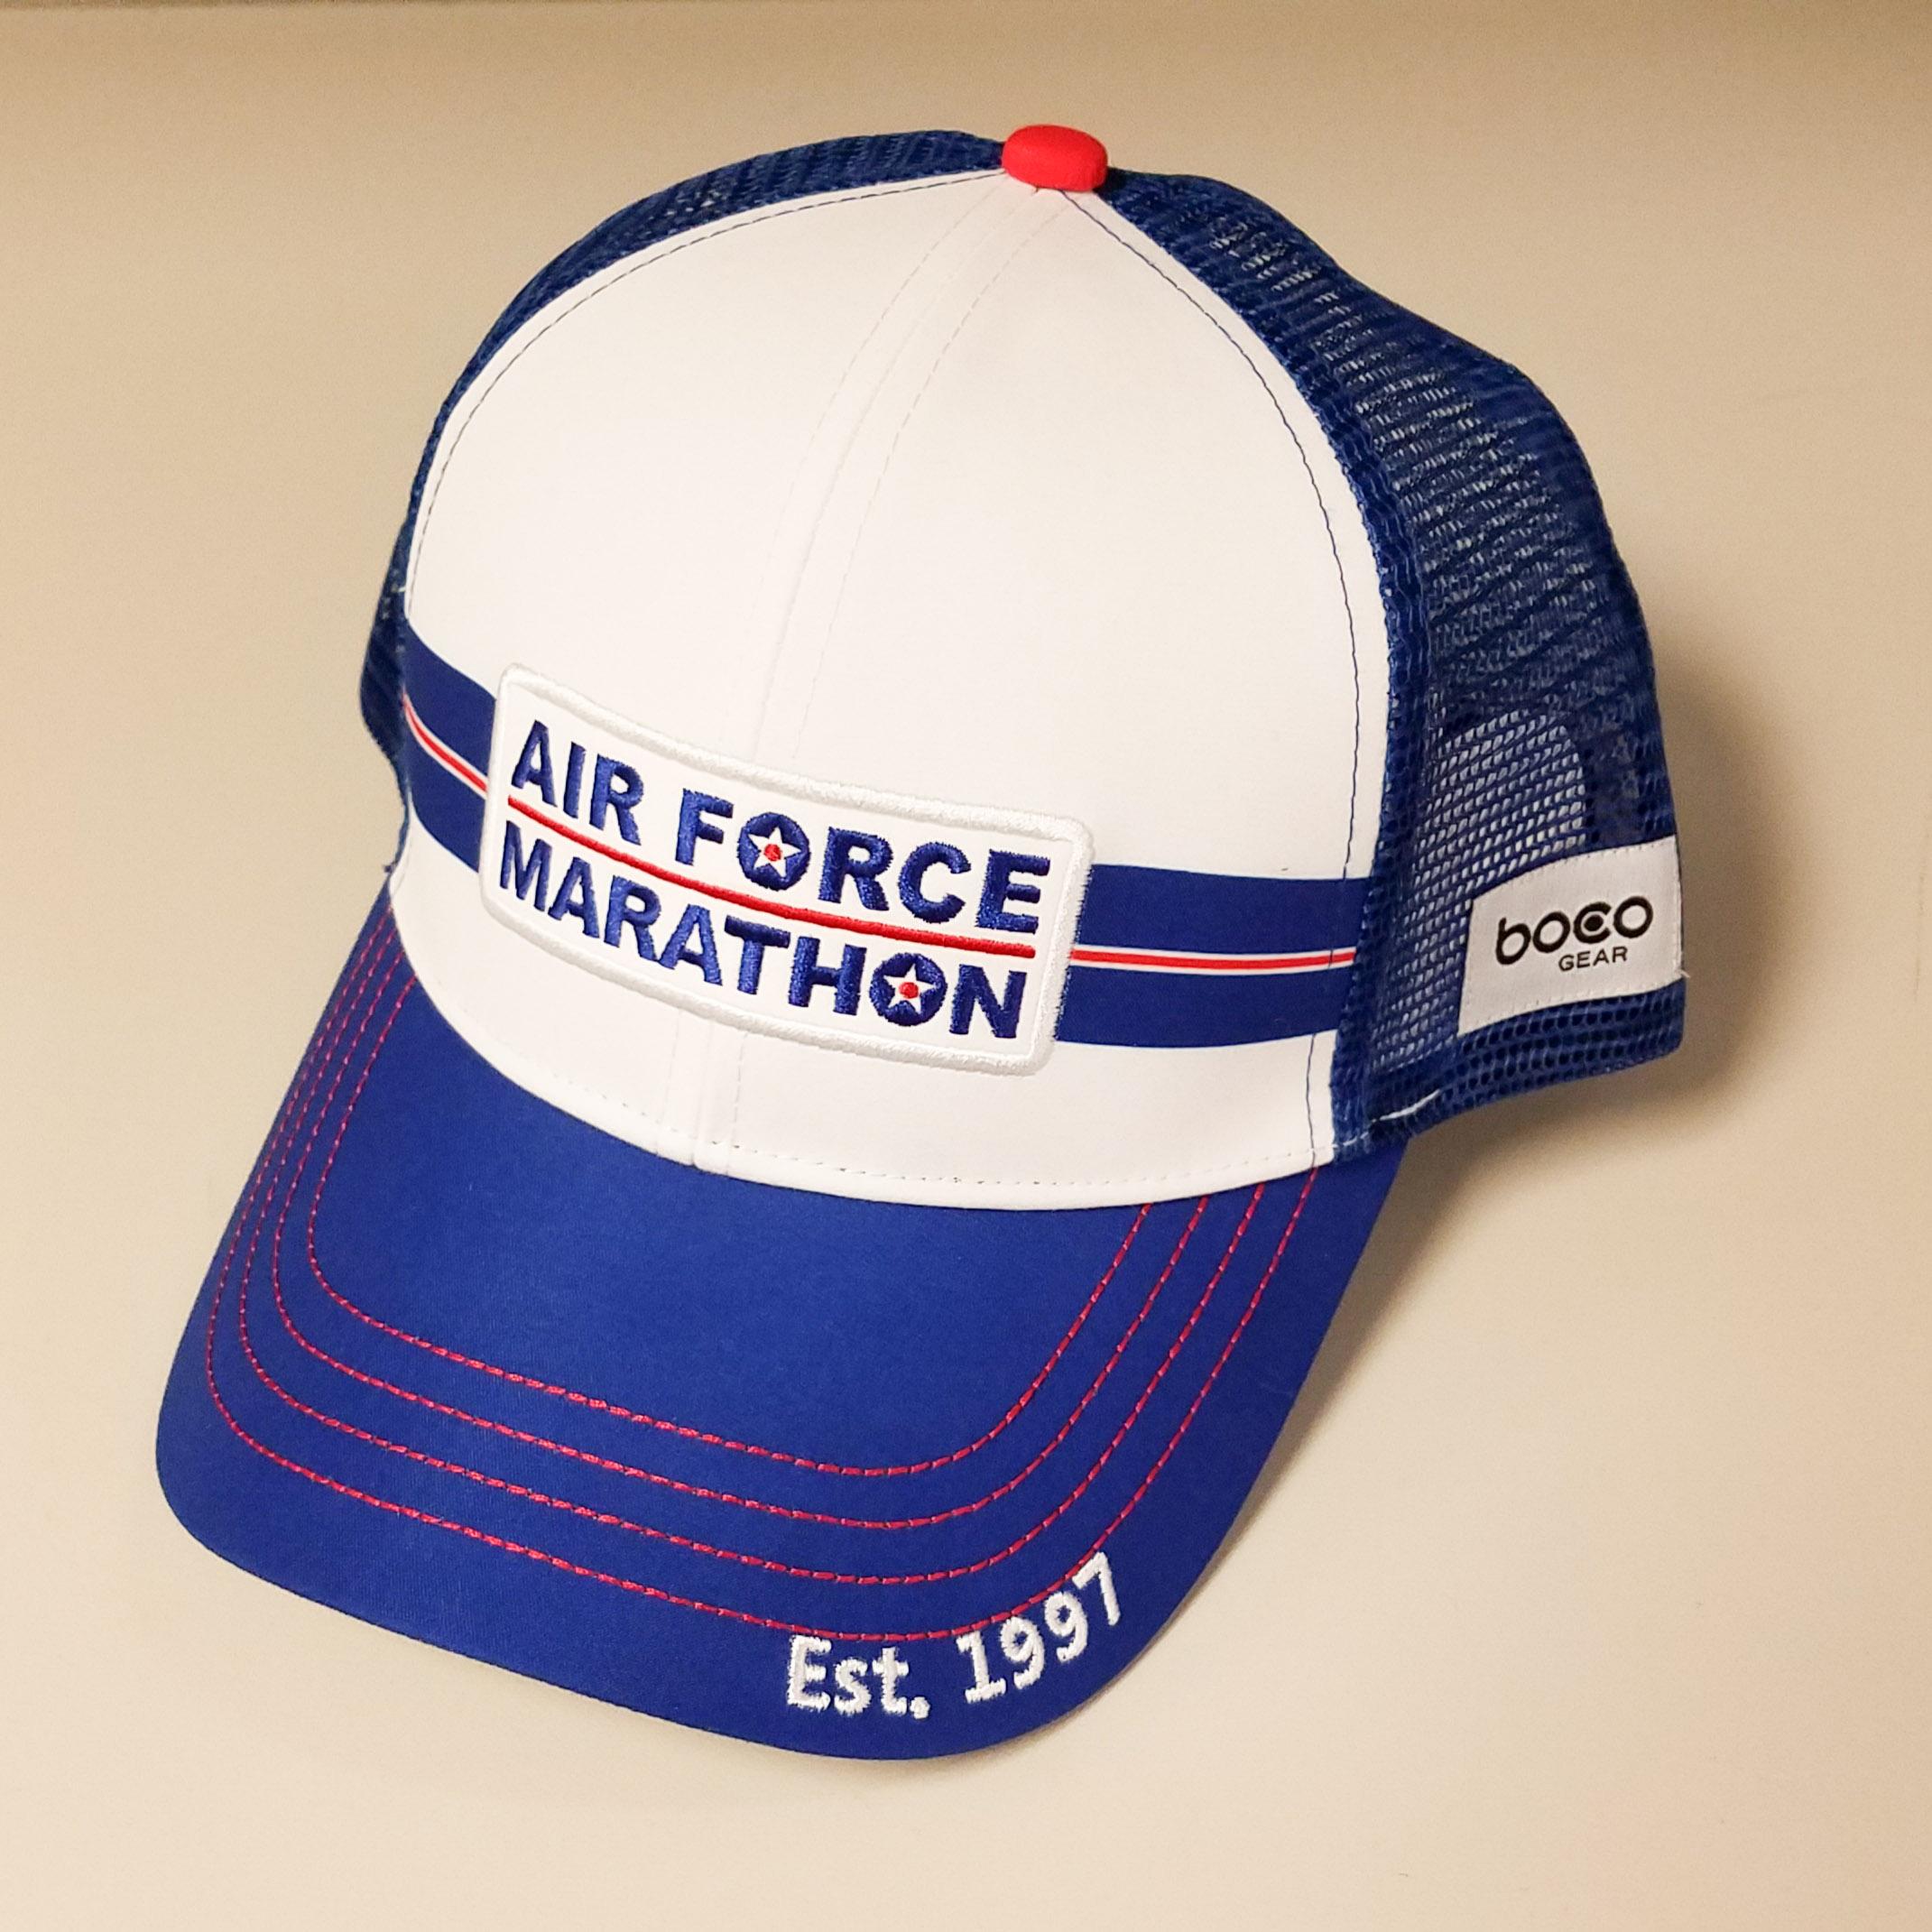 d28f2b78 Air Force Marathon Trucker Hat — Store — Air Force Marathon - Military/Active  Duty/Reserve Registrations — Race Roster